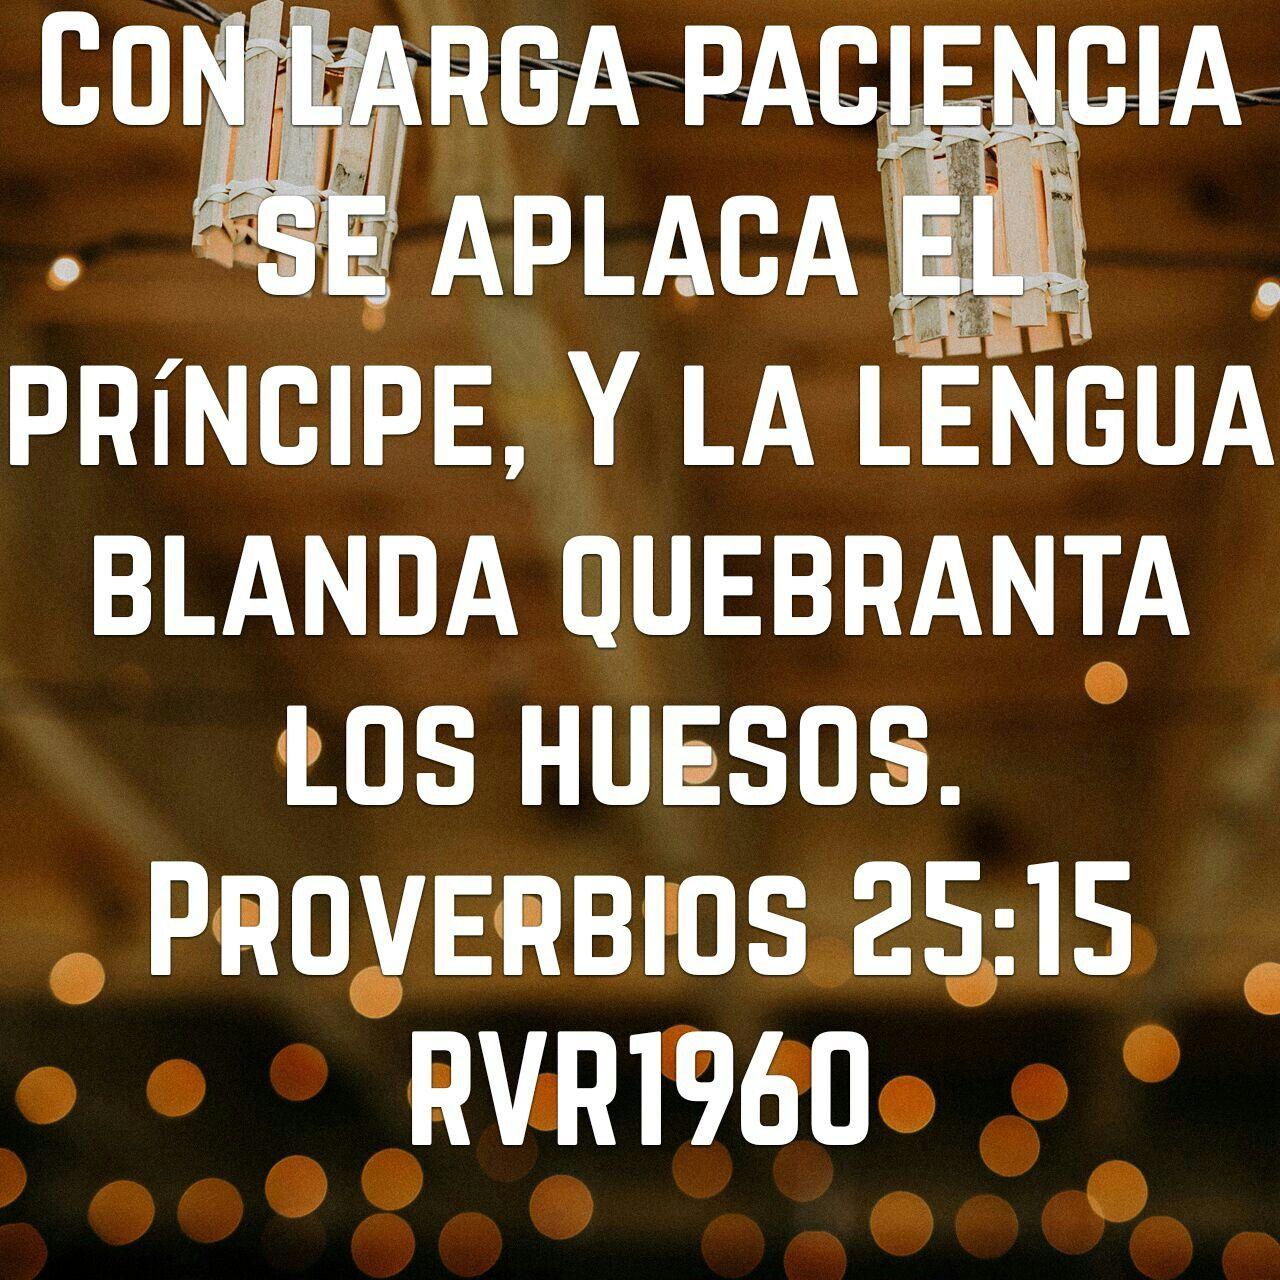 Versiculos De La Biblia De Animo: Pin By Pedro Pichardo Medina On Cristianos.